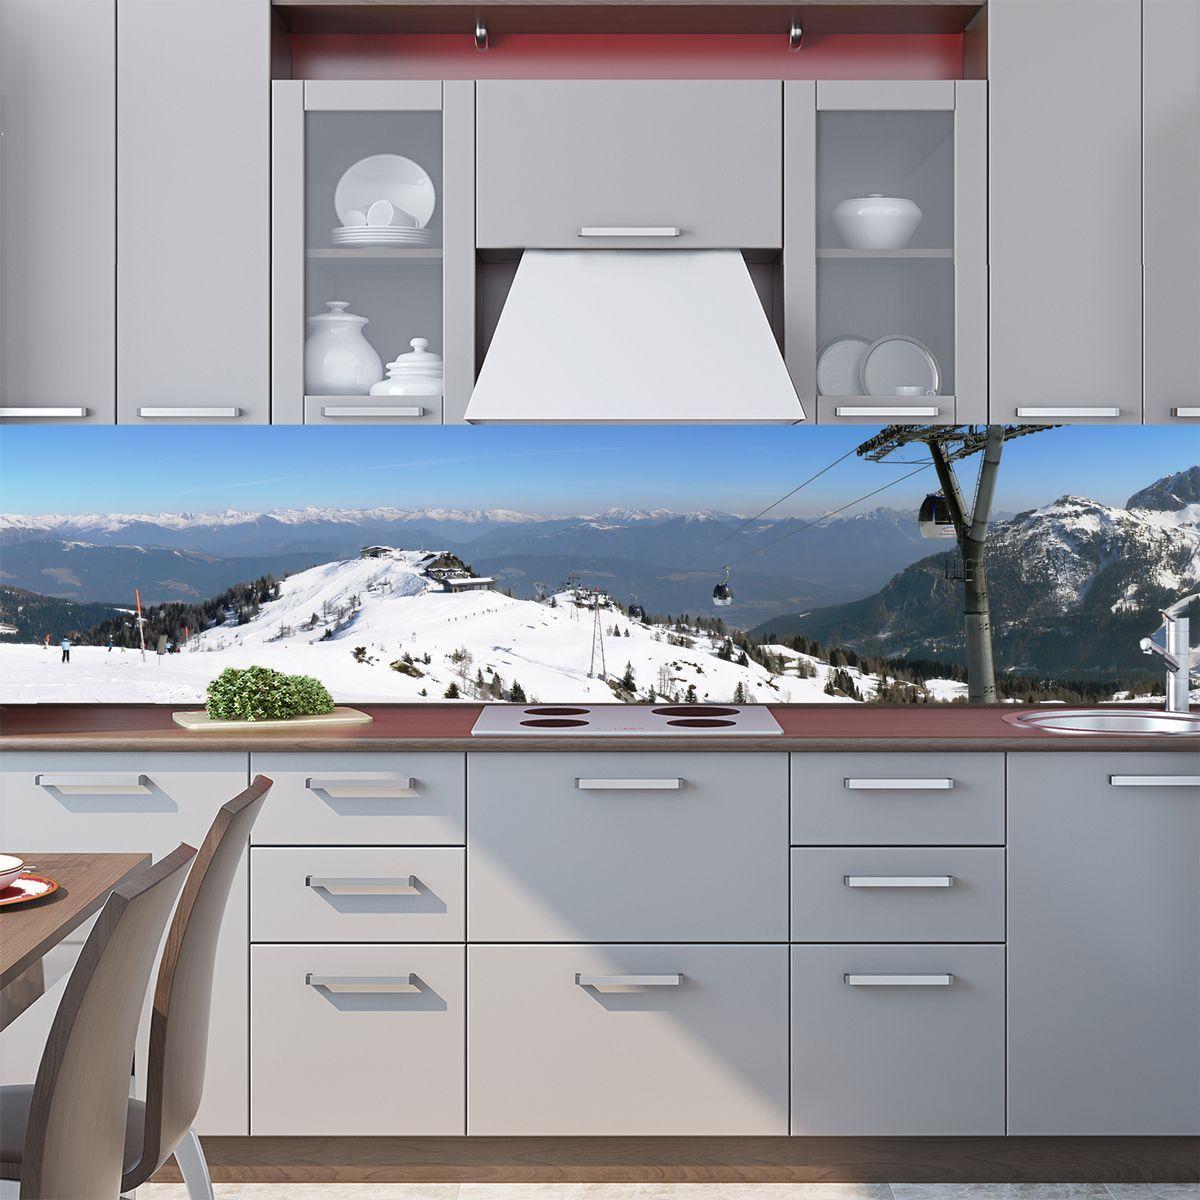 Kitchen Backsplash - Outside the window of the Alps